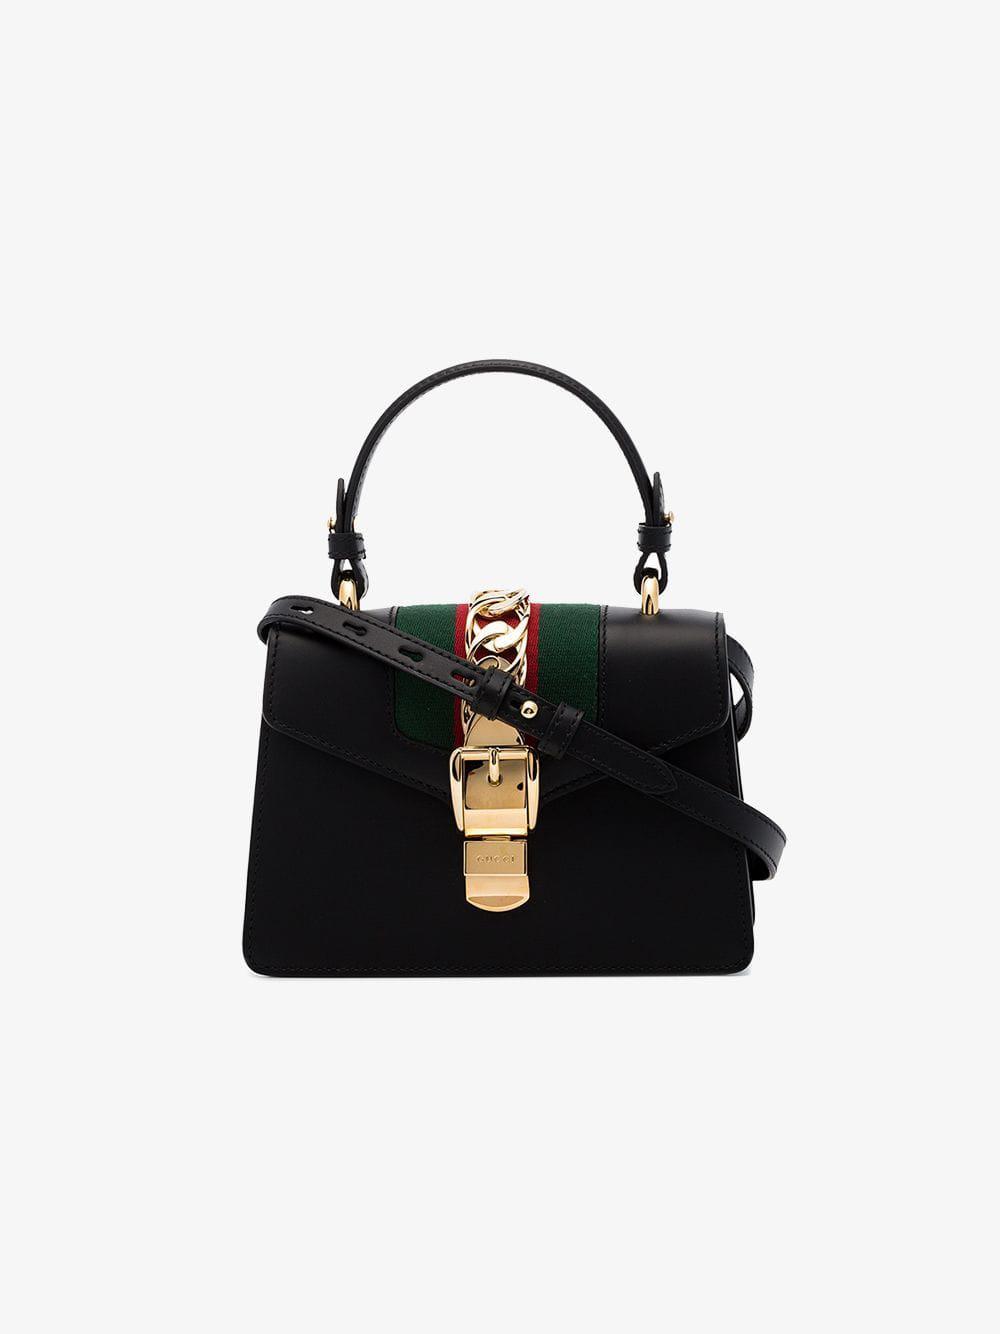 38a80d45455d Gucci Black Sylvie Mini Bag in Black - Save 14% - Lyst